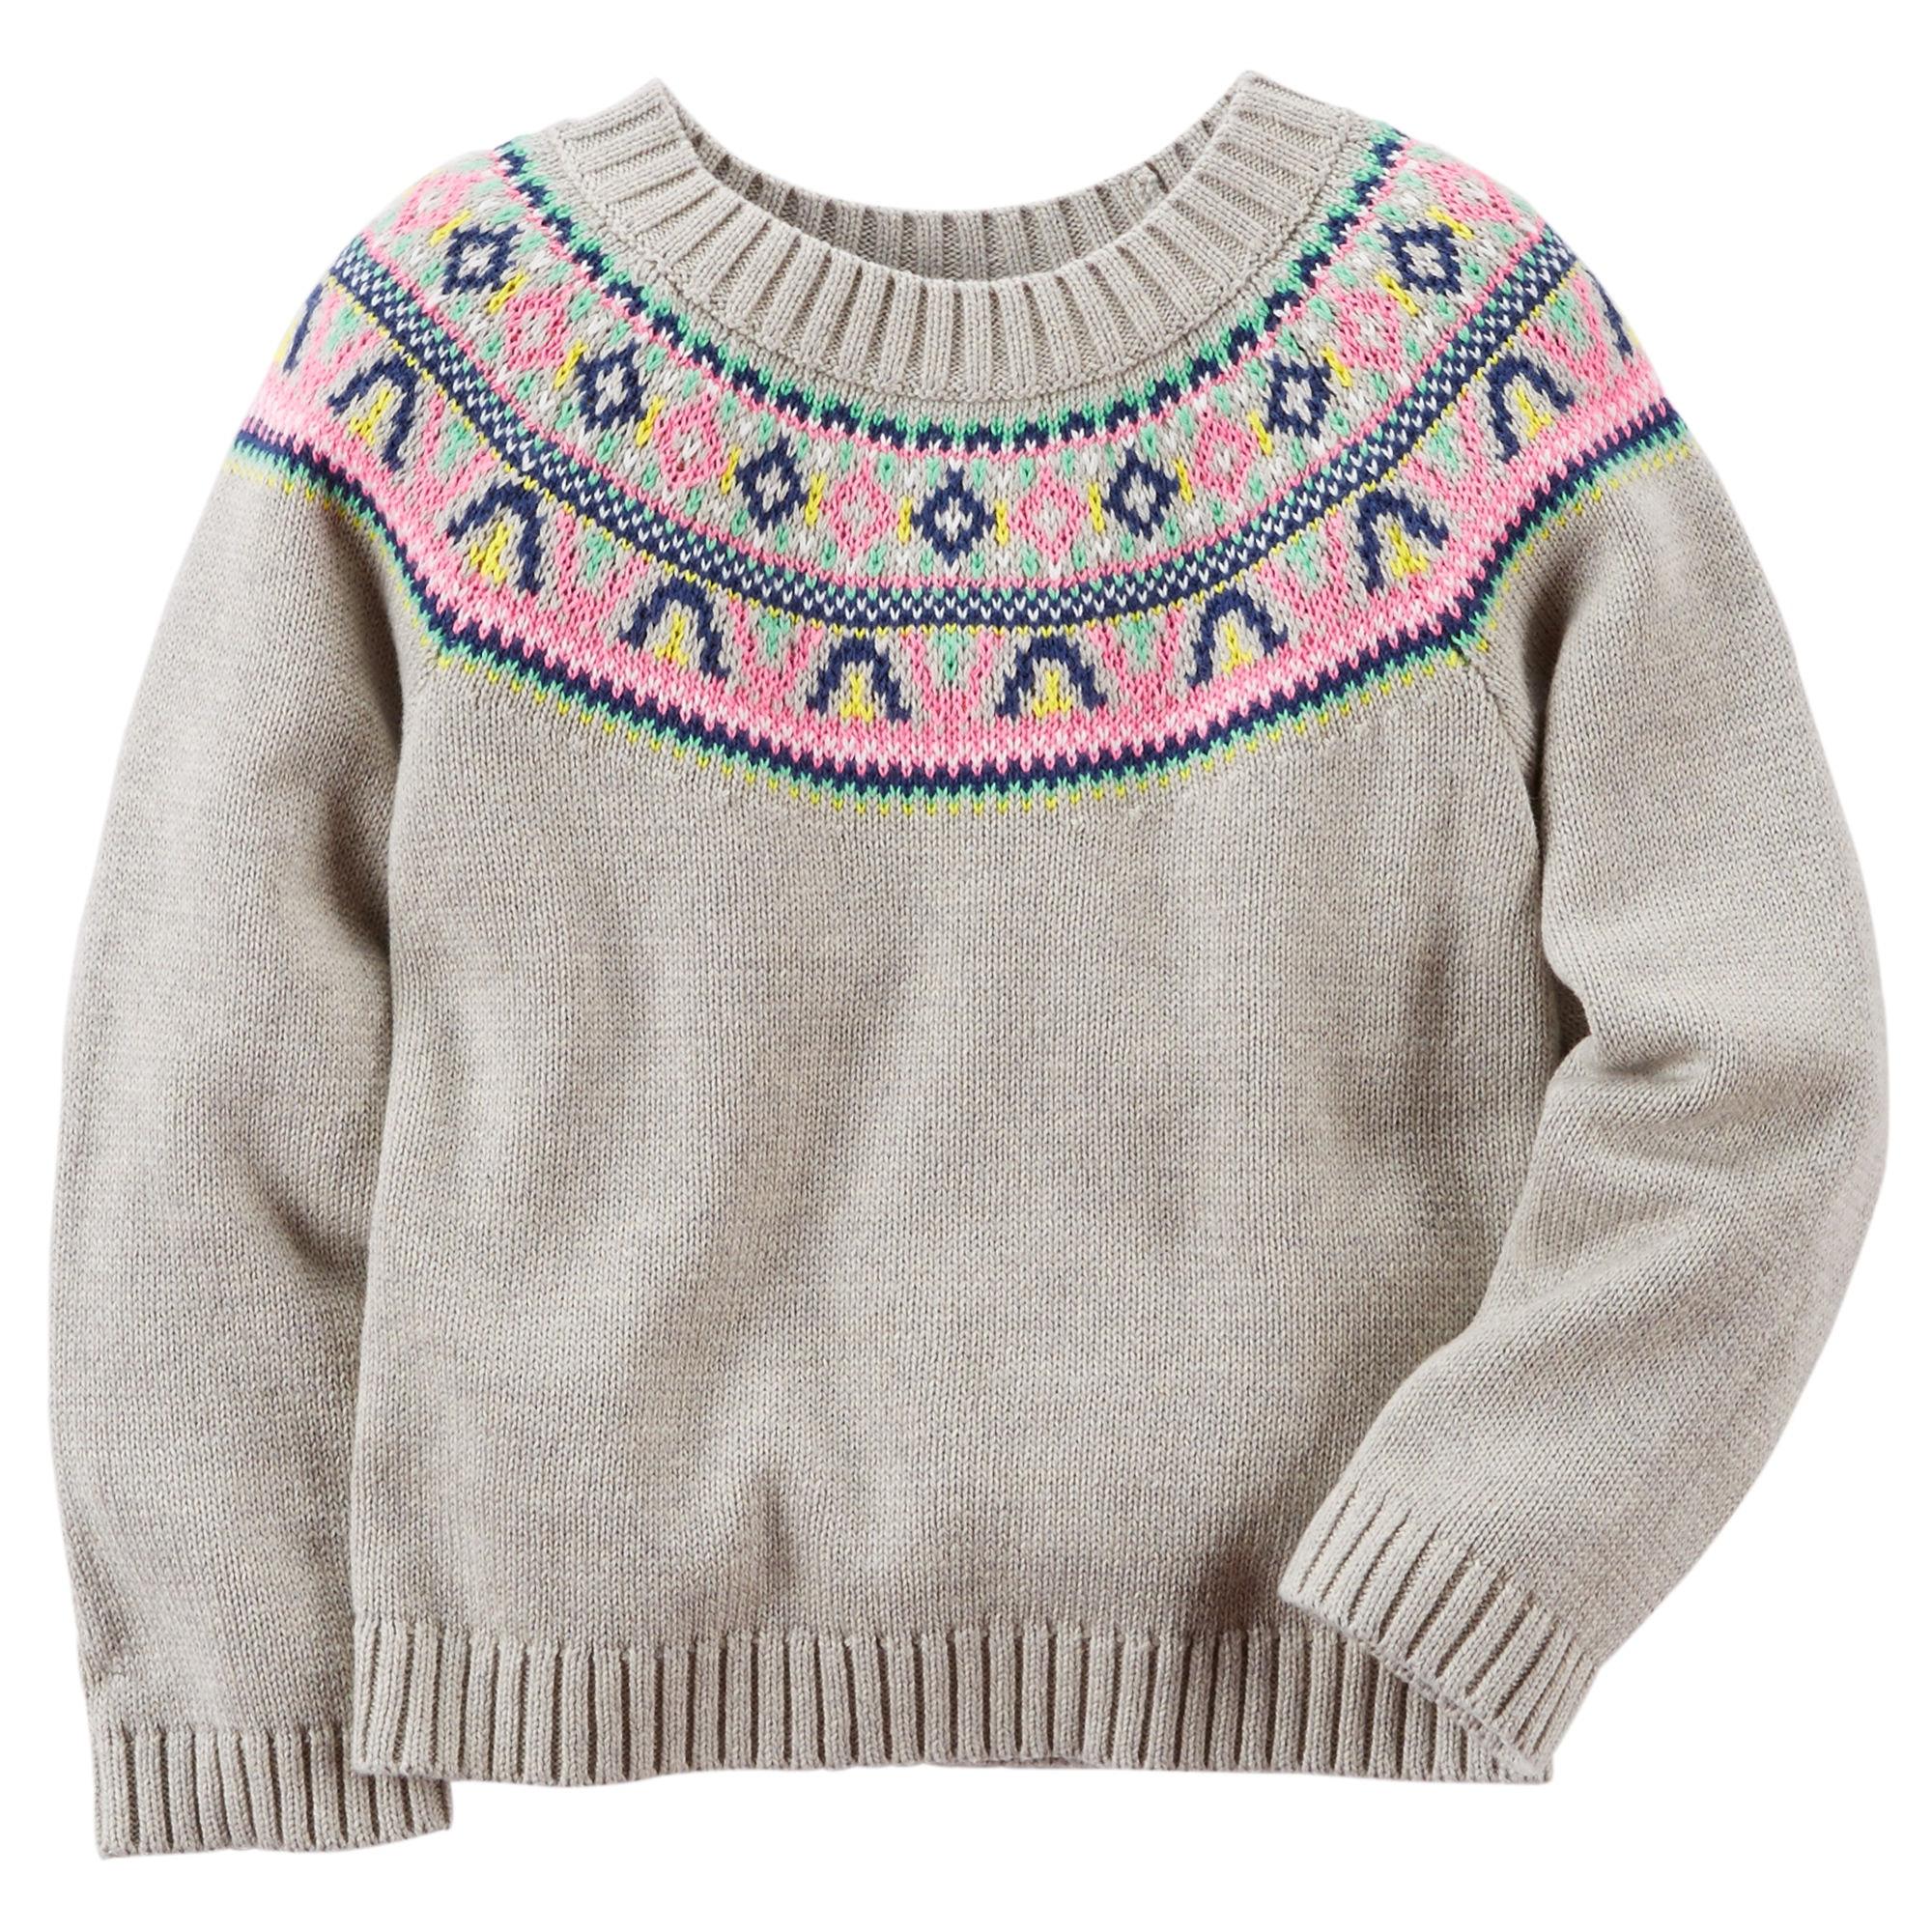 Fair Isle Sweater | Ll Bean Ragg Sweater | J Crew Fair Isle Sweater